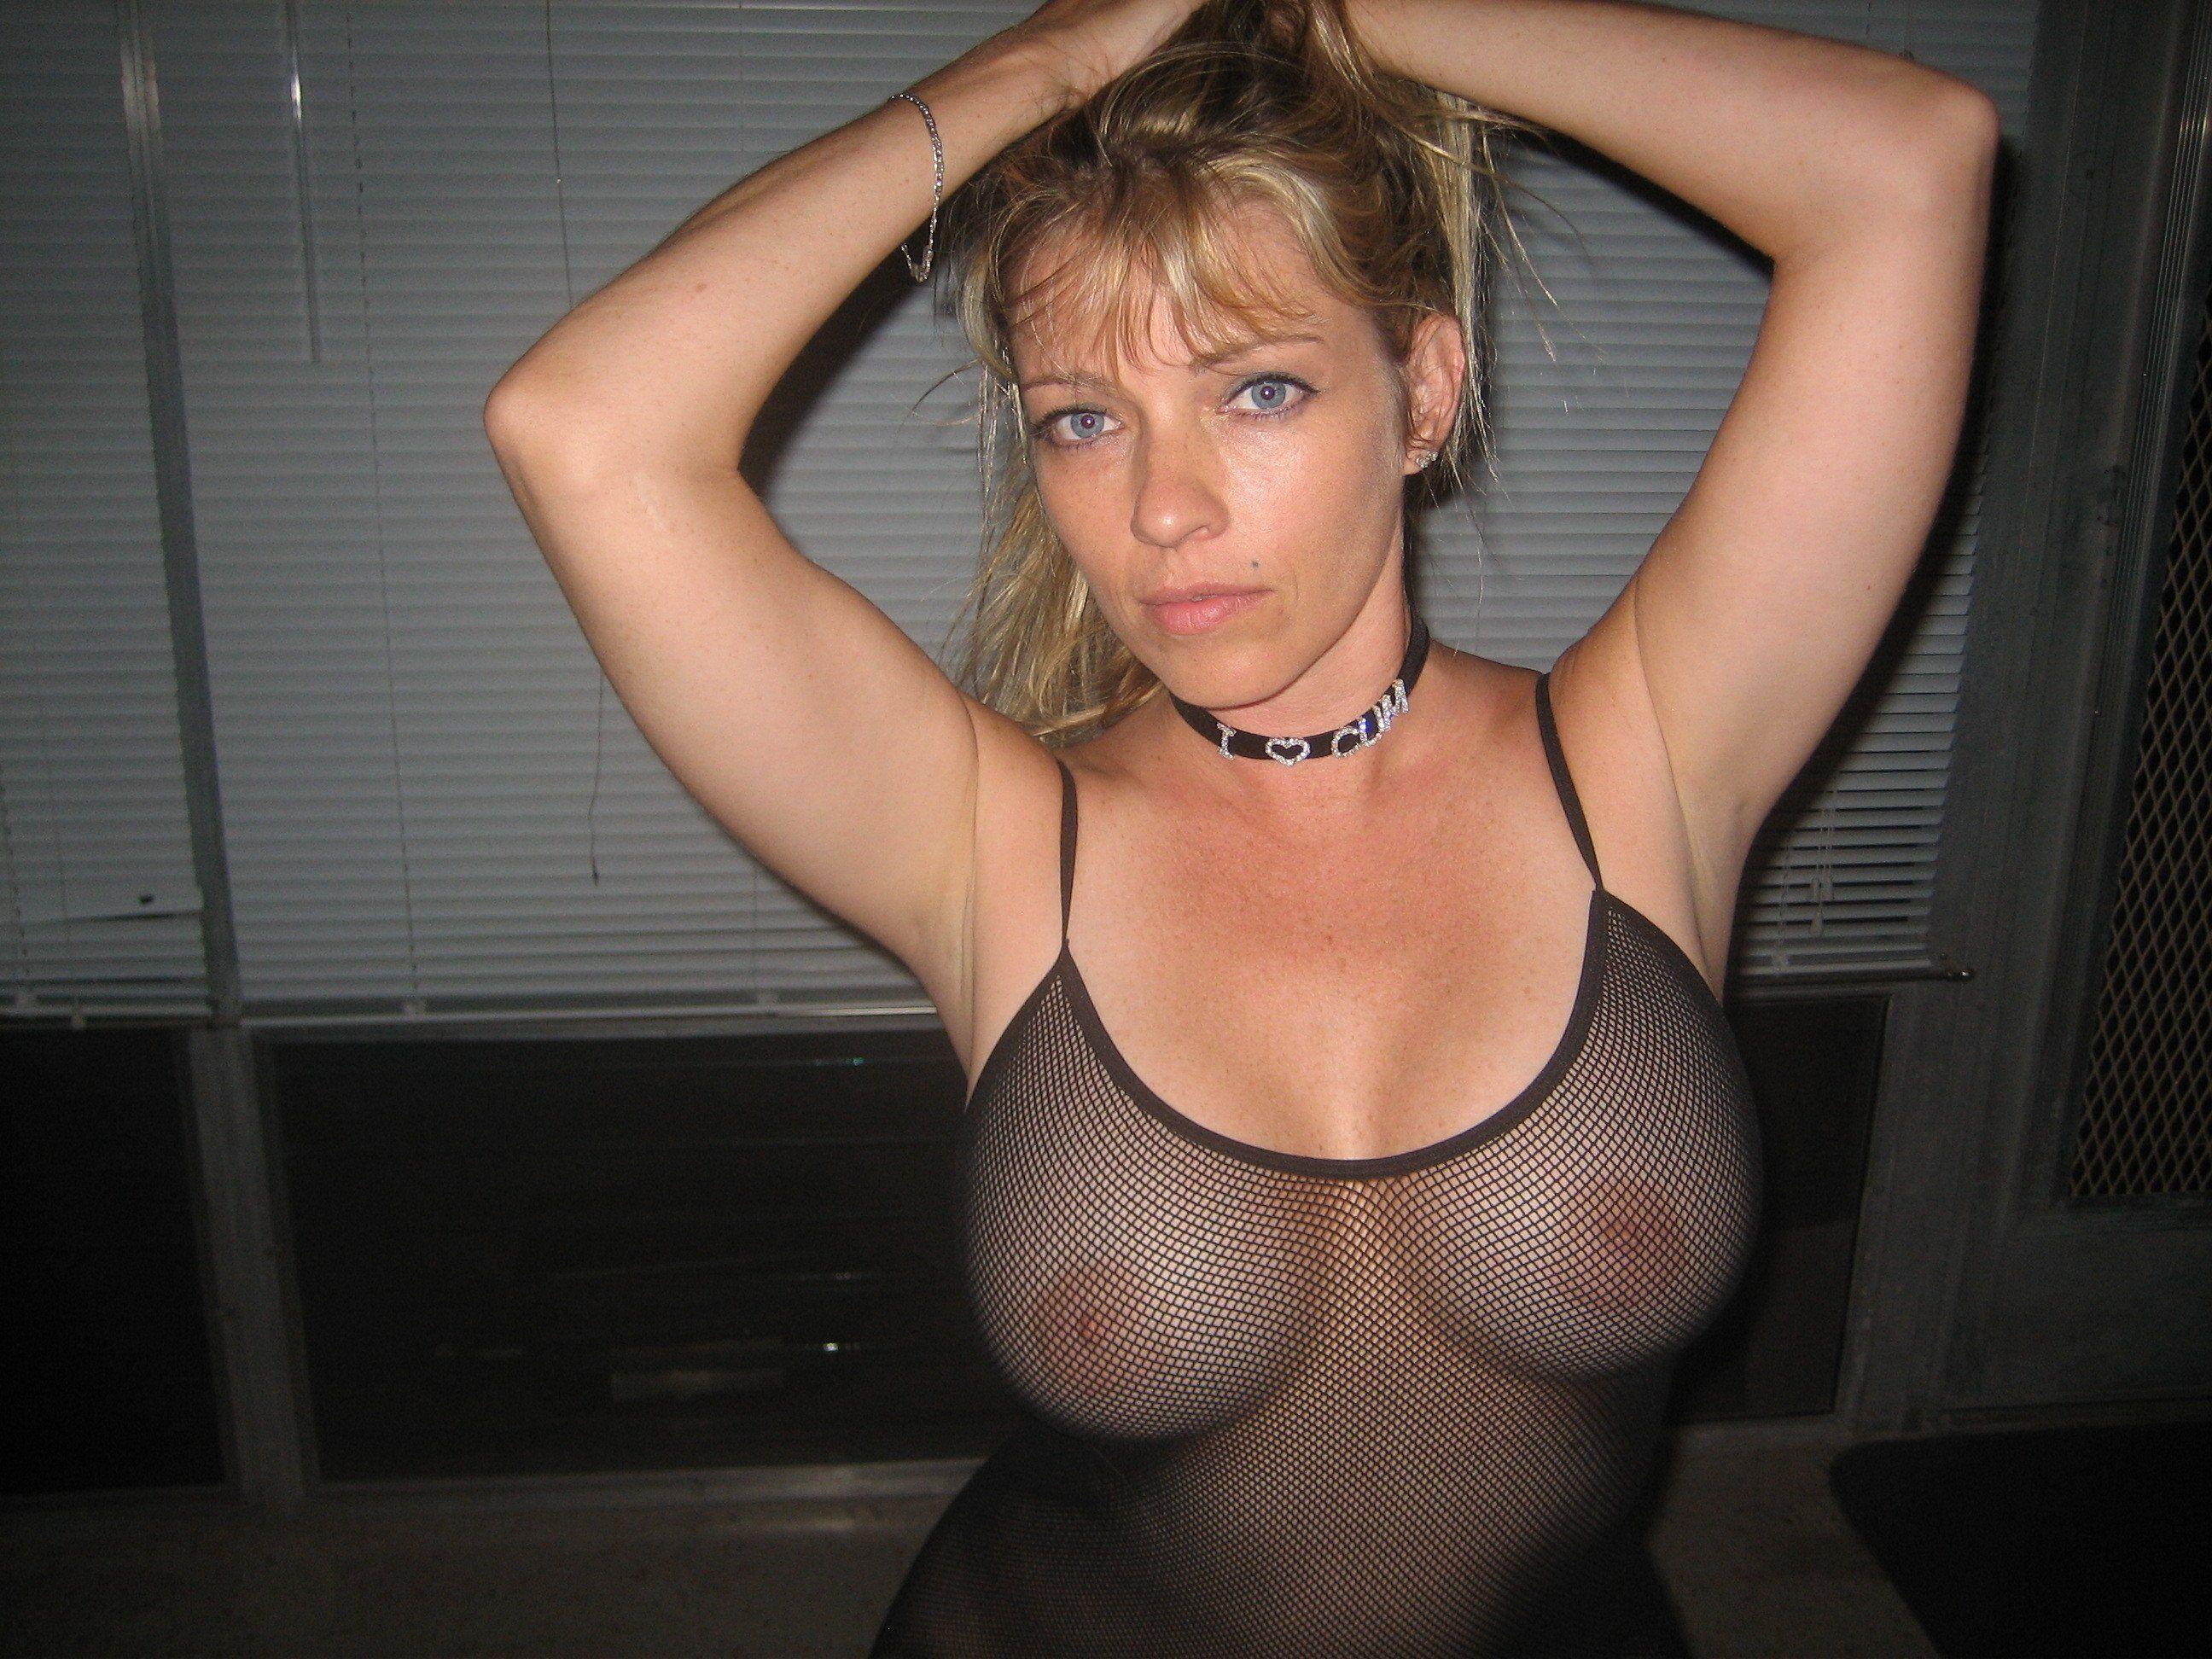 Speak Sexiest tank top sluts